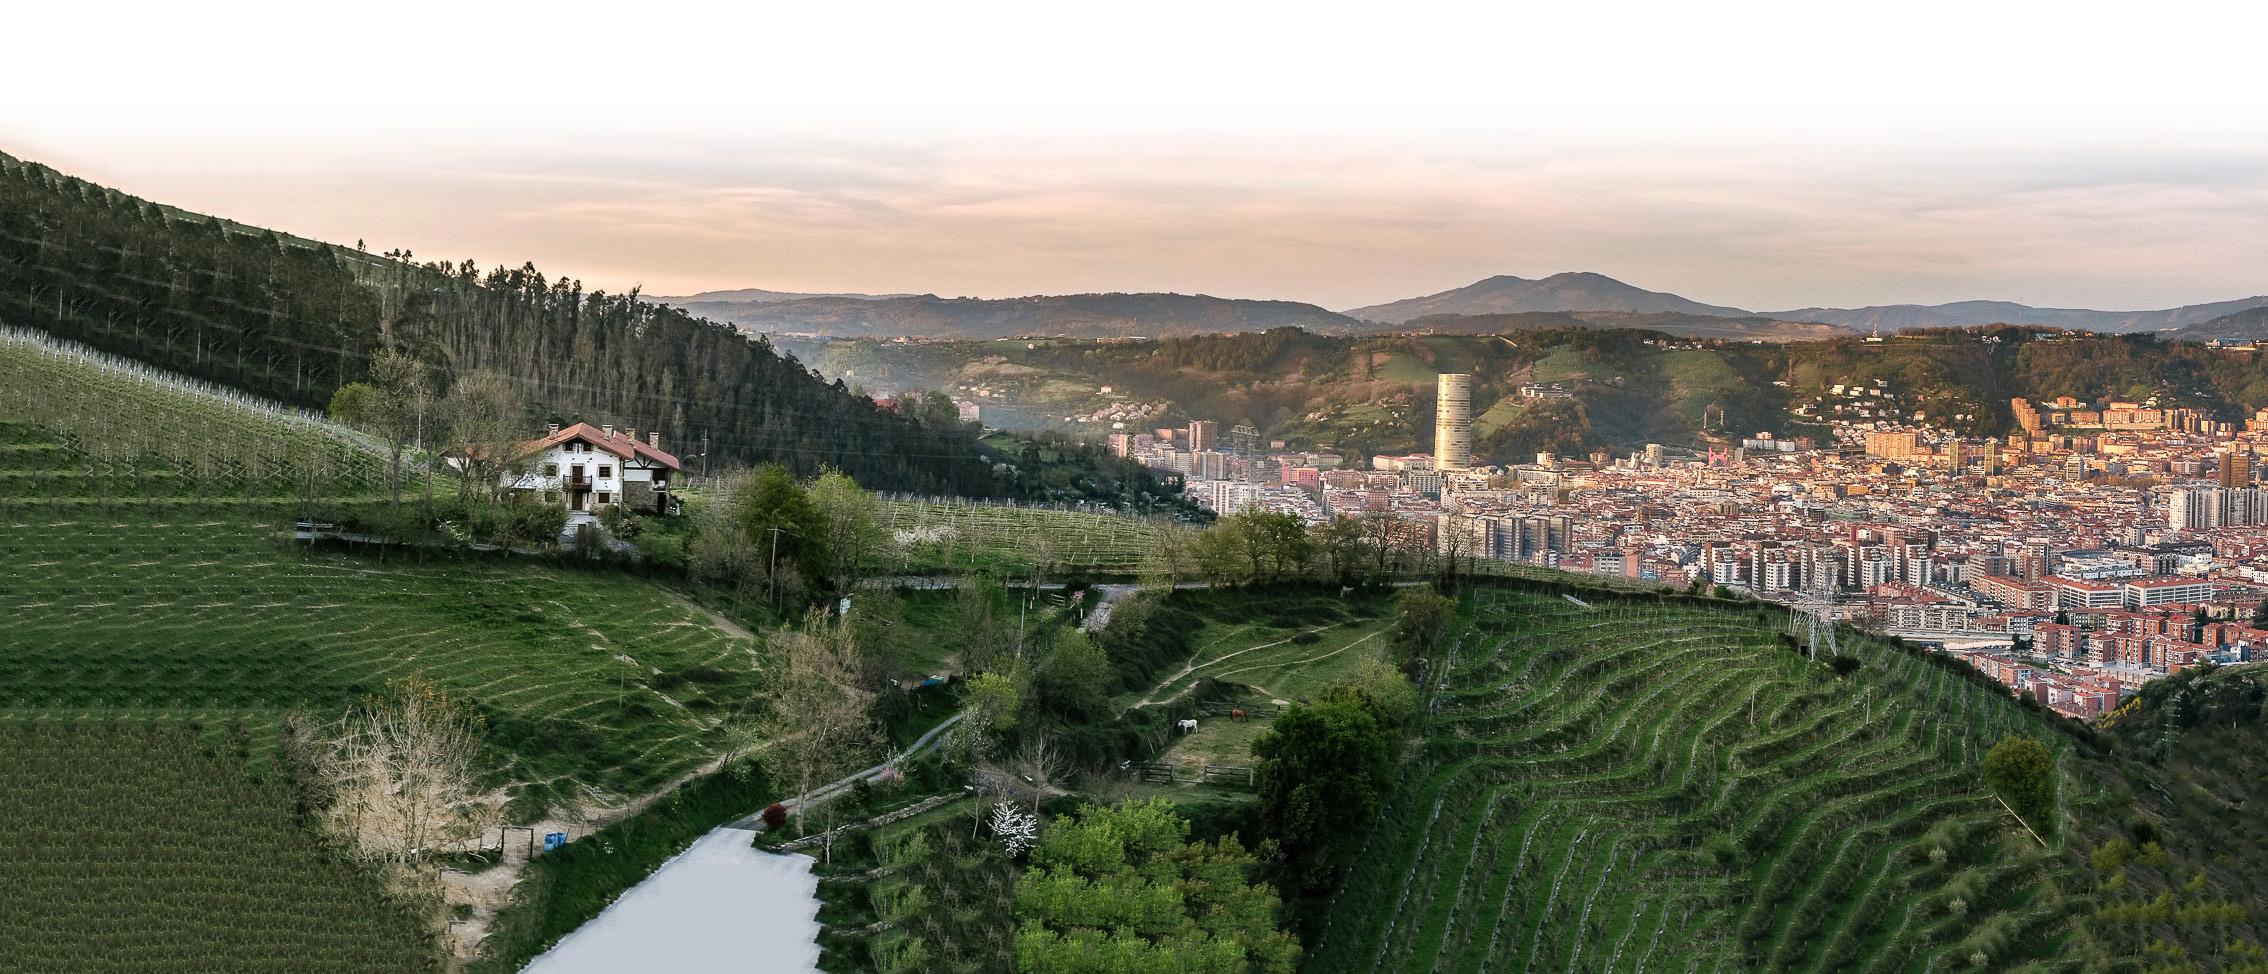 Txakoli Bilbao Munetaberri paisaje ciudad